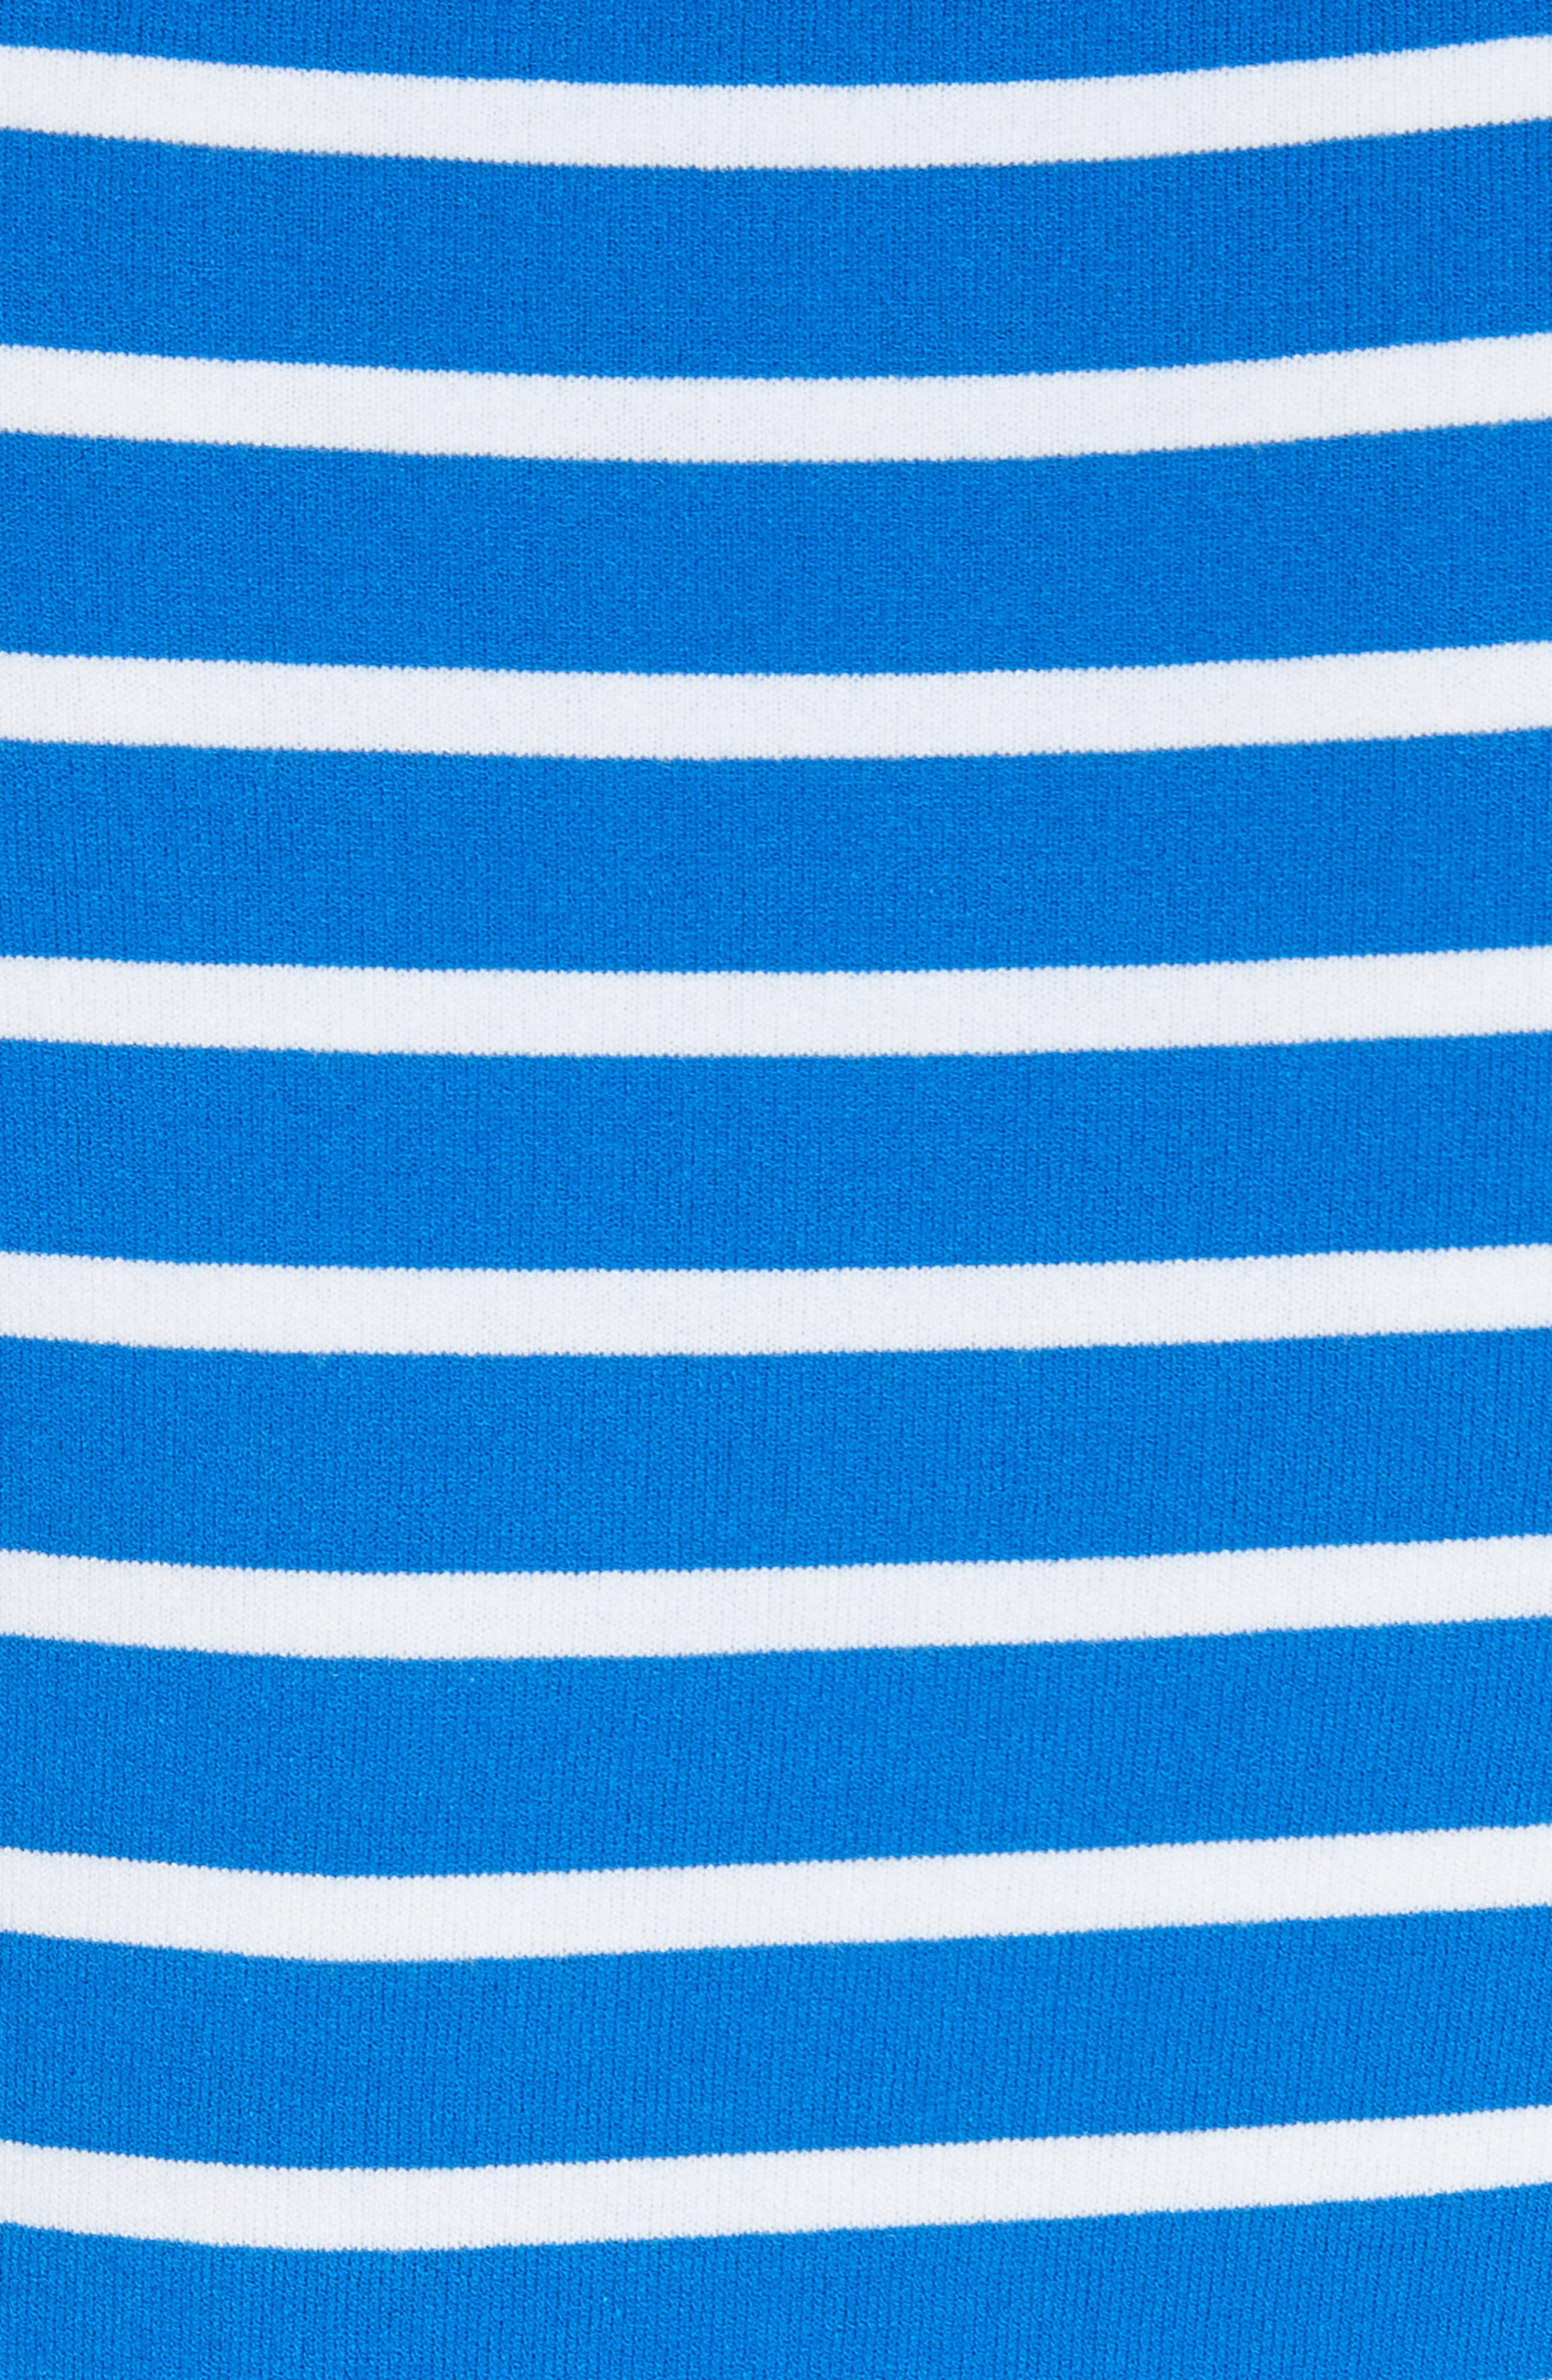 Stripe Tee,                             Alternate thumbnail 5, color,                             477